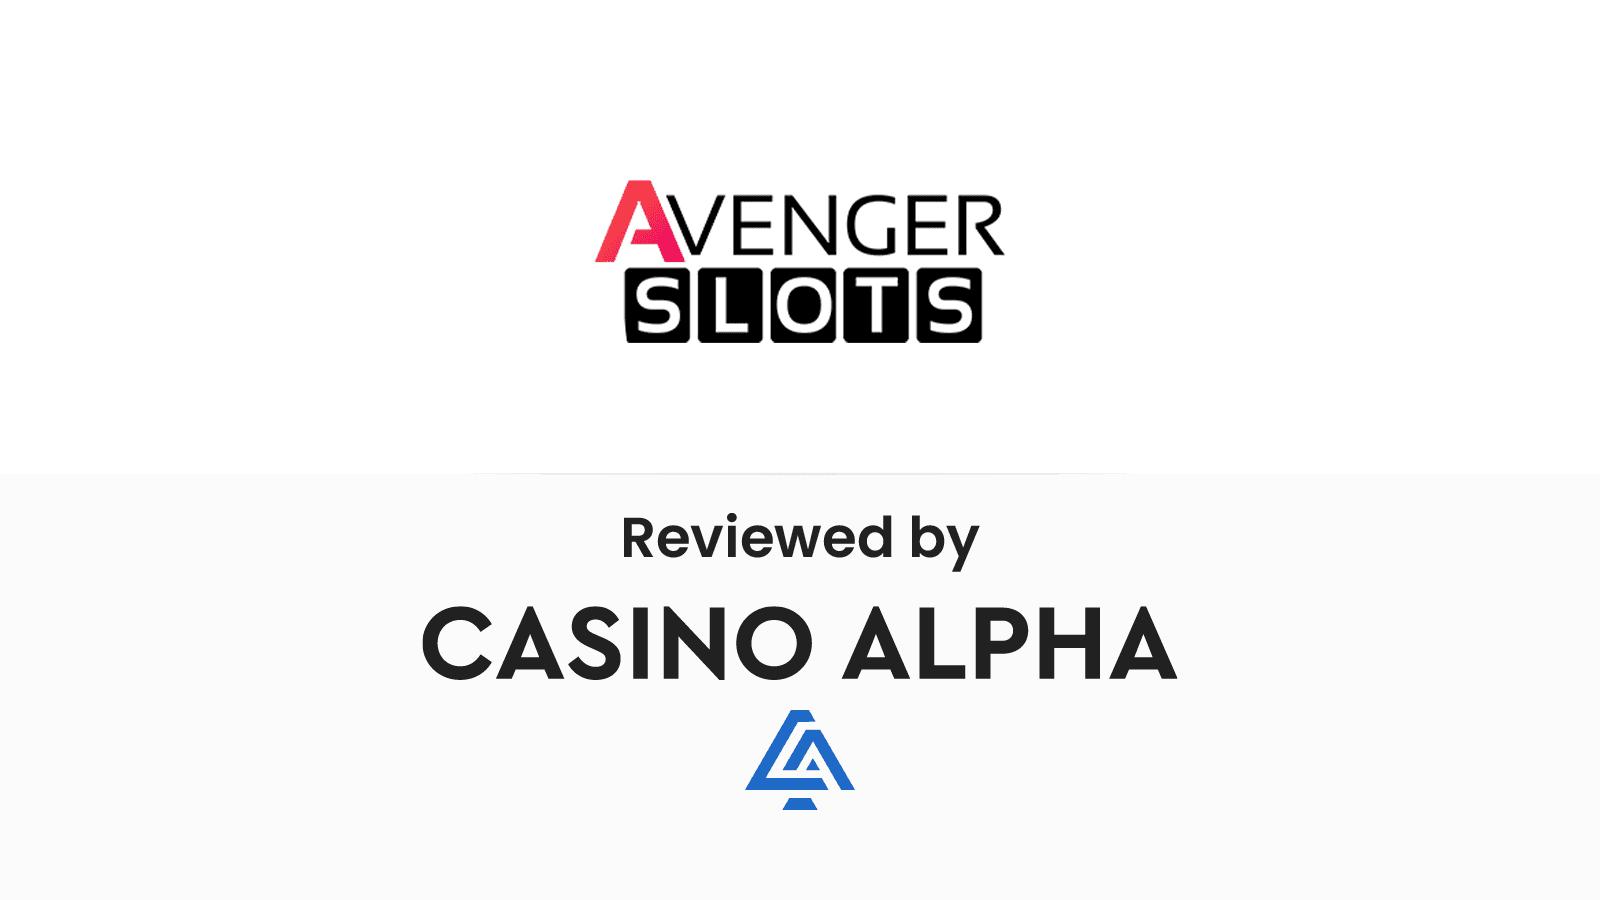 Avenger Slots Review & Promotions List